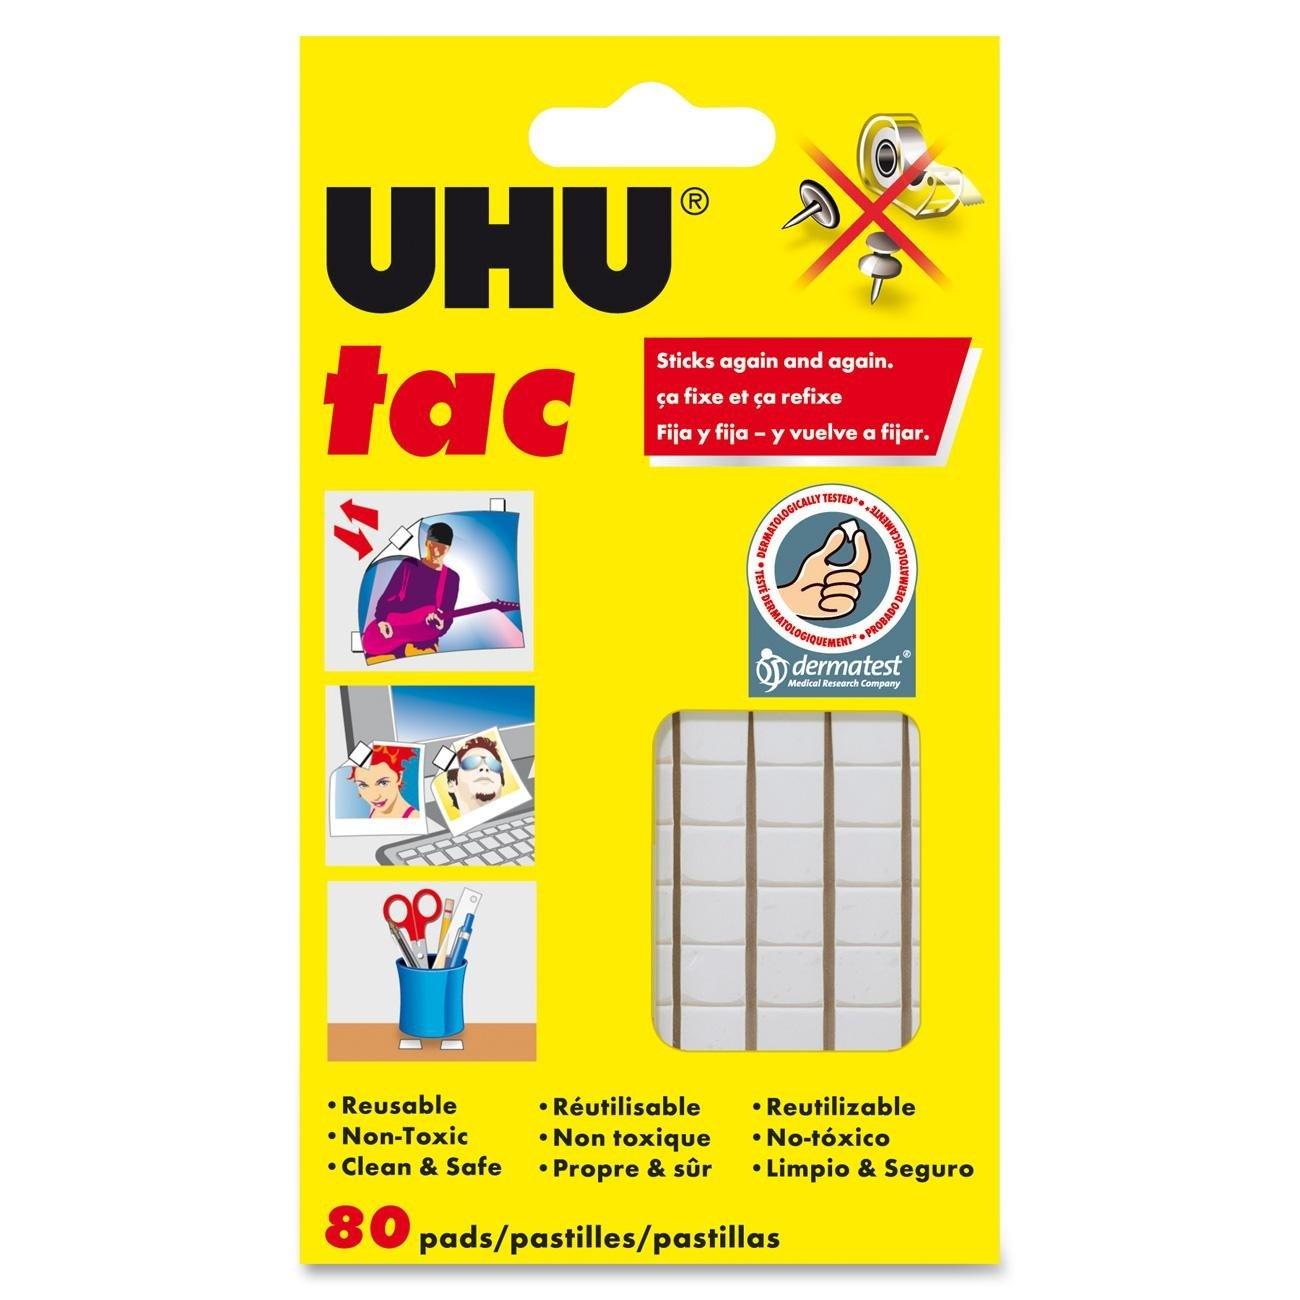 amazon com saunders uhu tac removable adhesive putty tabs 2 1